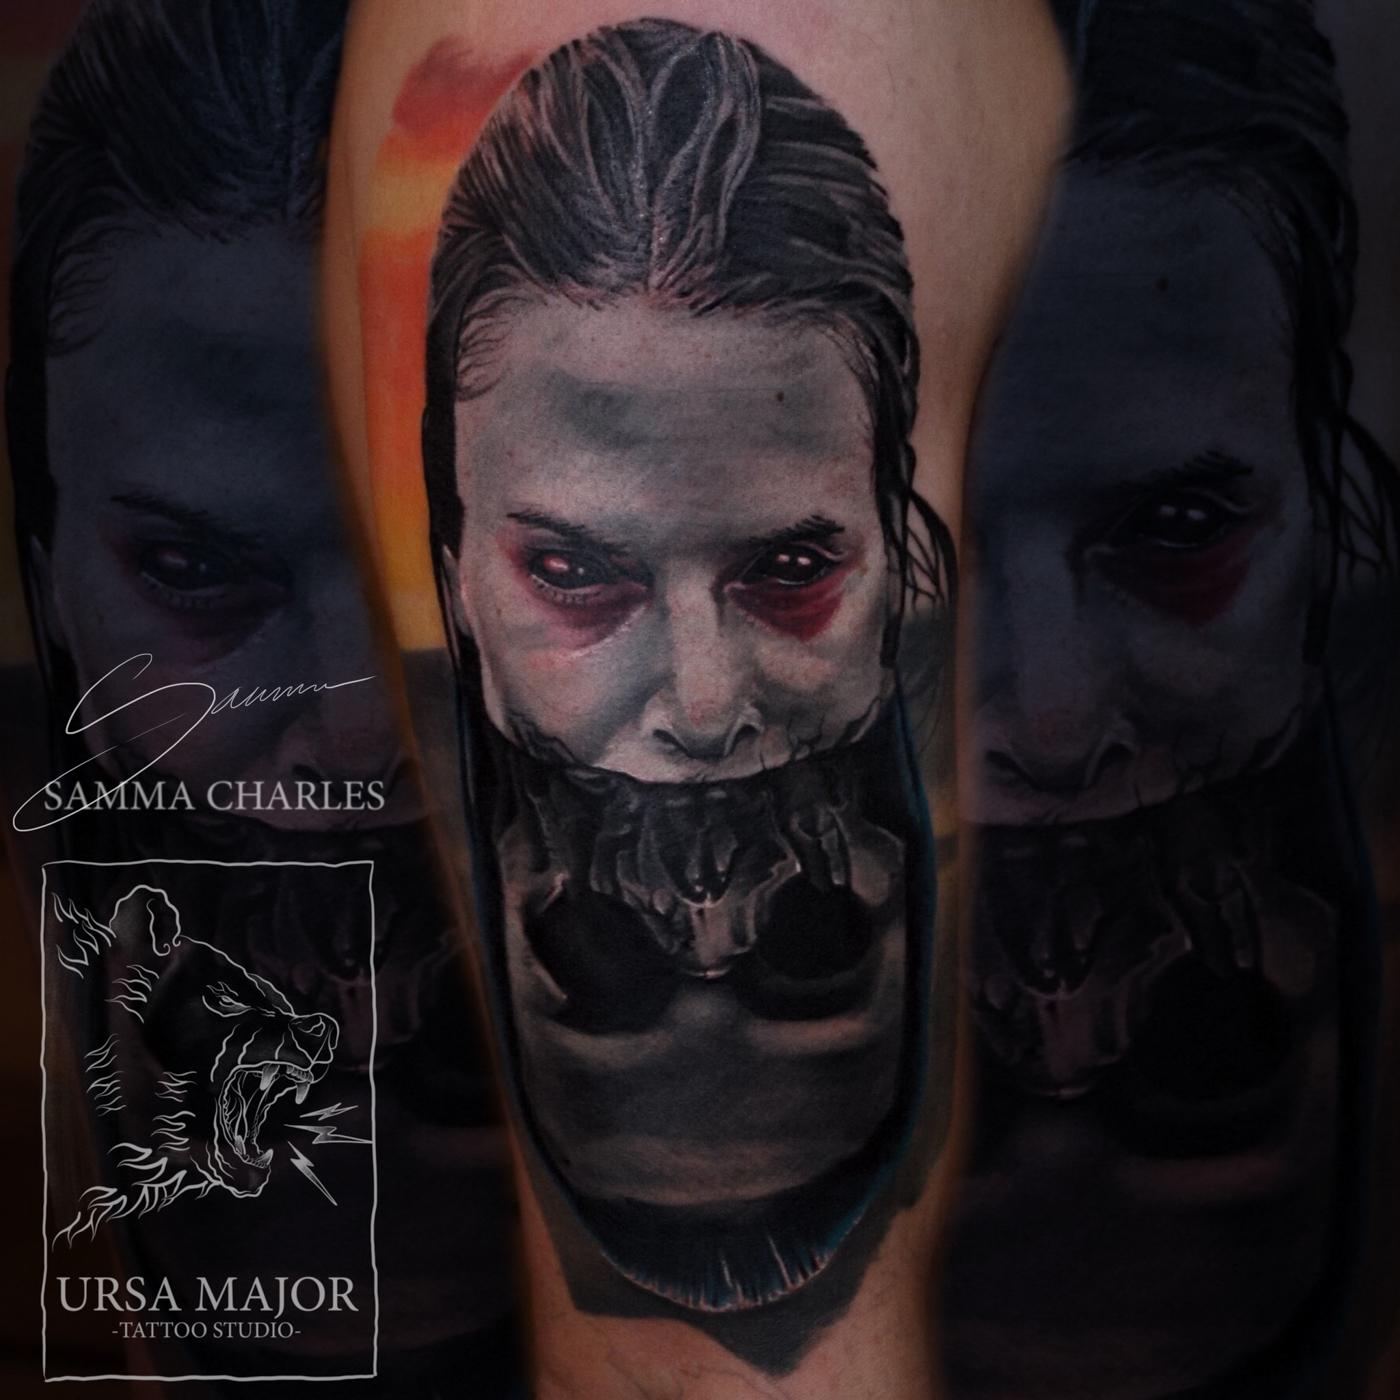 oxfordshire-tattoo-studio-39.jpg